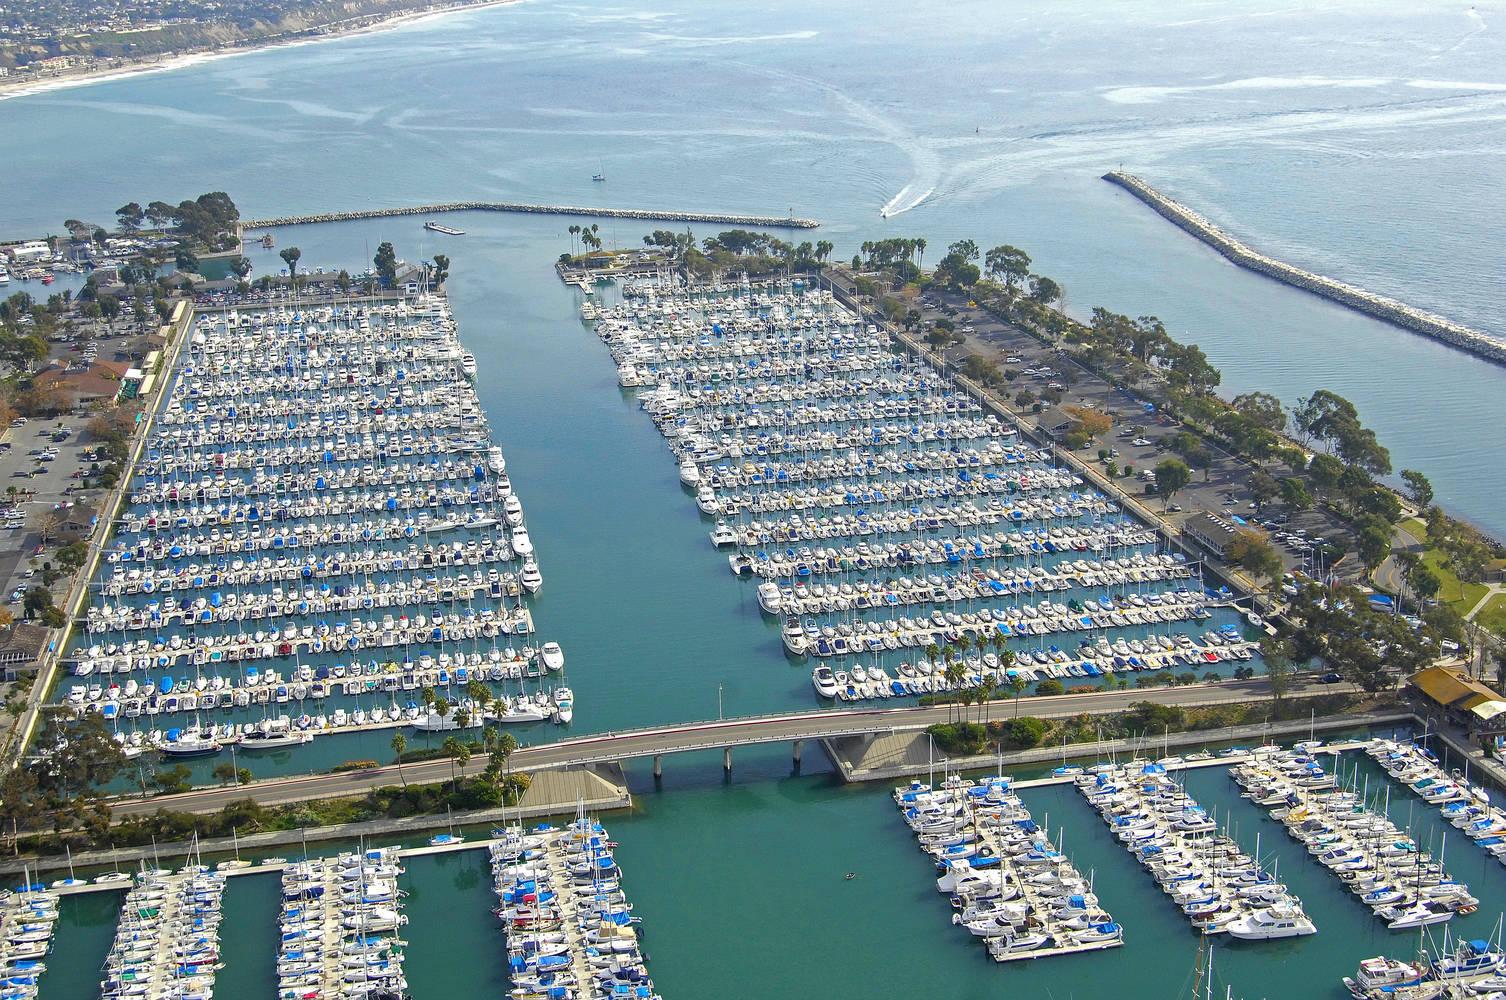 The Marina at Dana Point slip, dock, mooring reservations